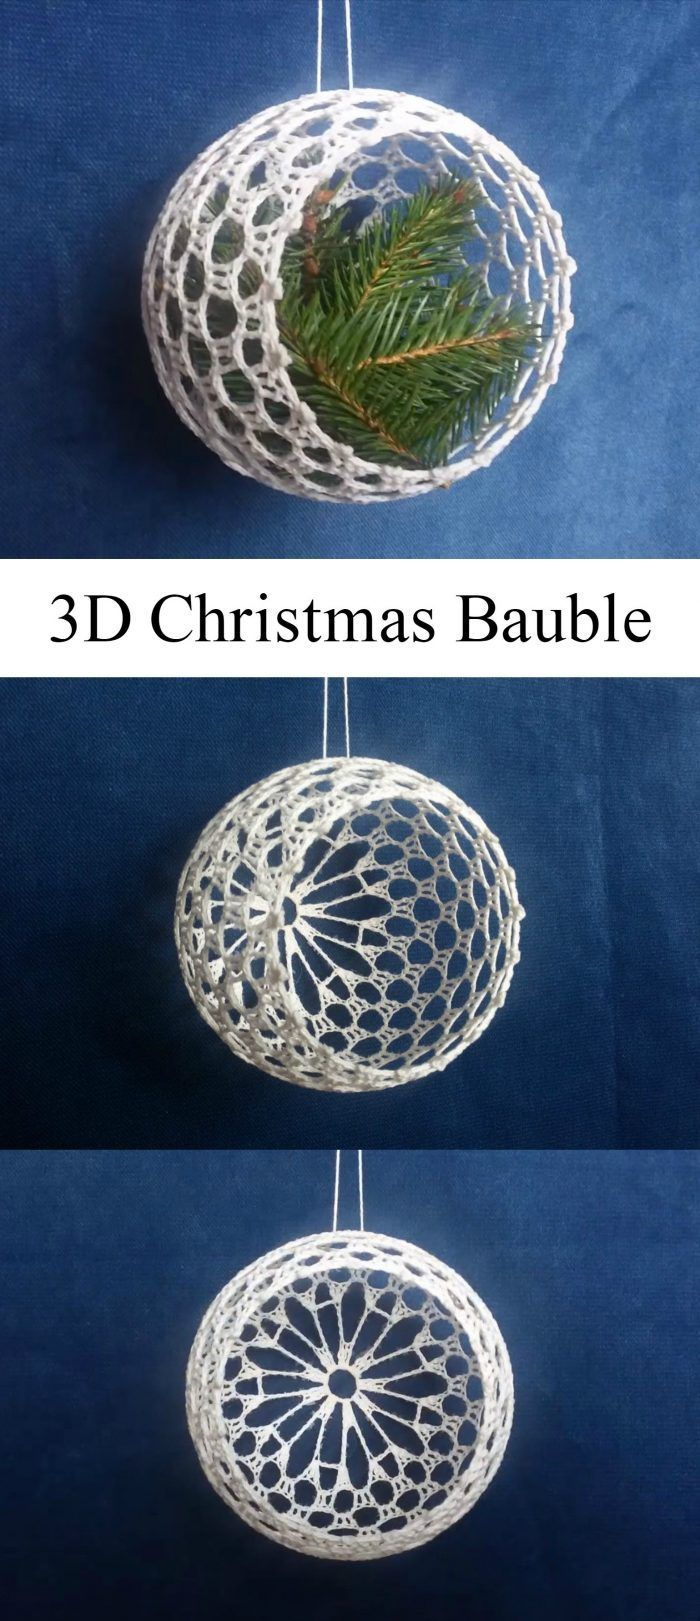 Crochet 3d Christmas Baubles Crochet Christmas Gifts Christmas Crochet Patterns Crochet Christmas Decorations